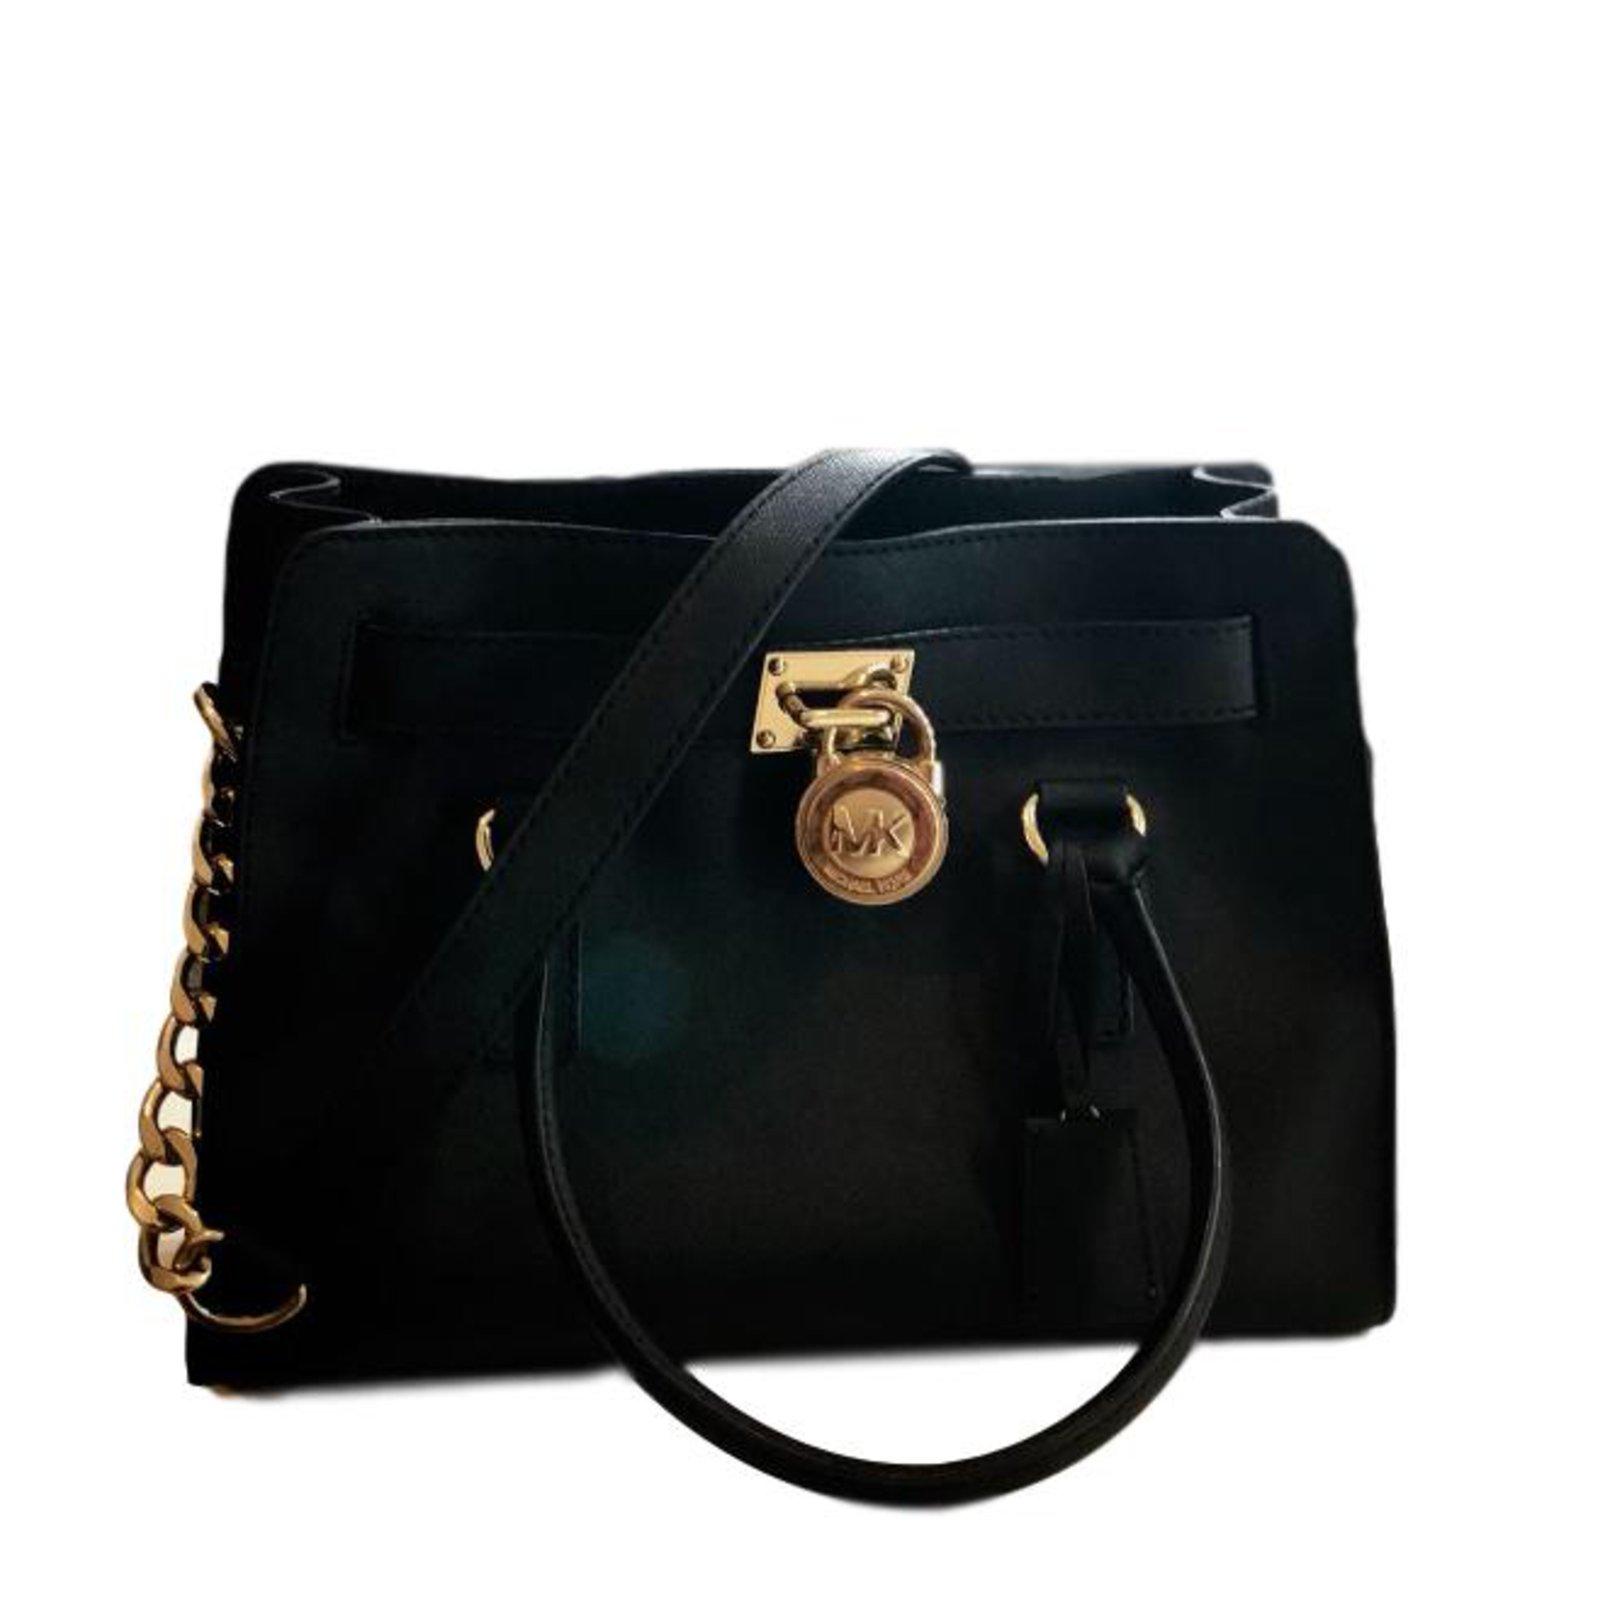 Sac à Main Leather Bag Michael Kors Hamilton Medium Size En